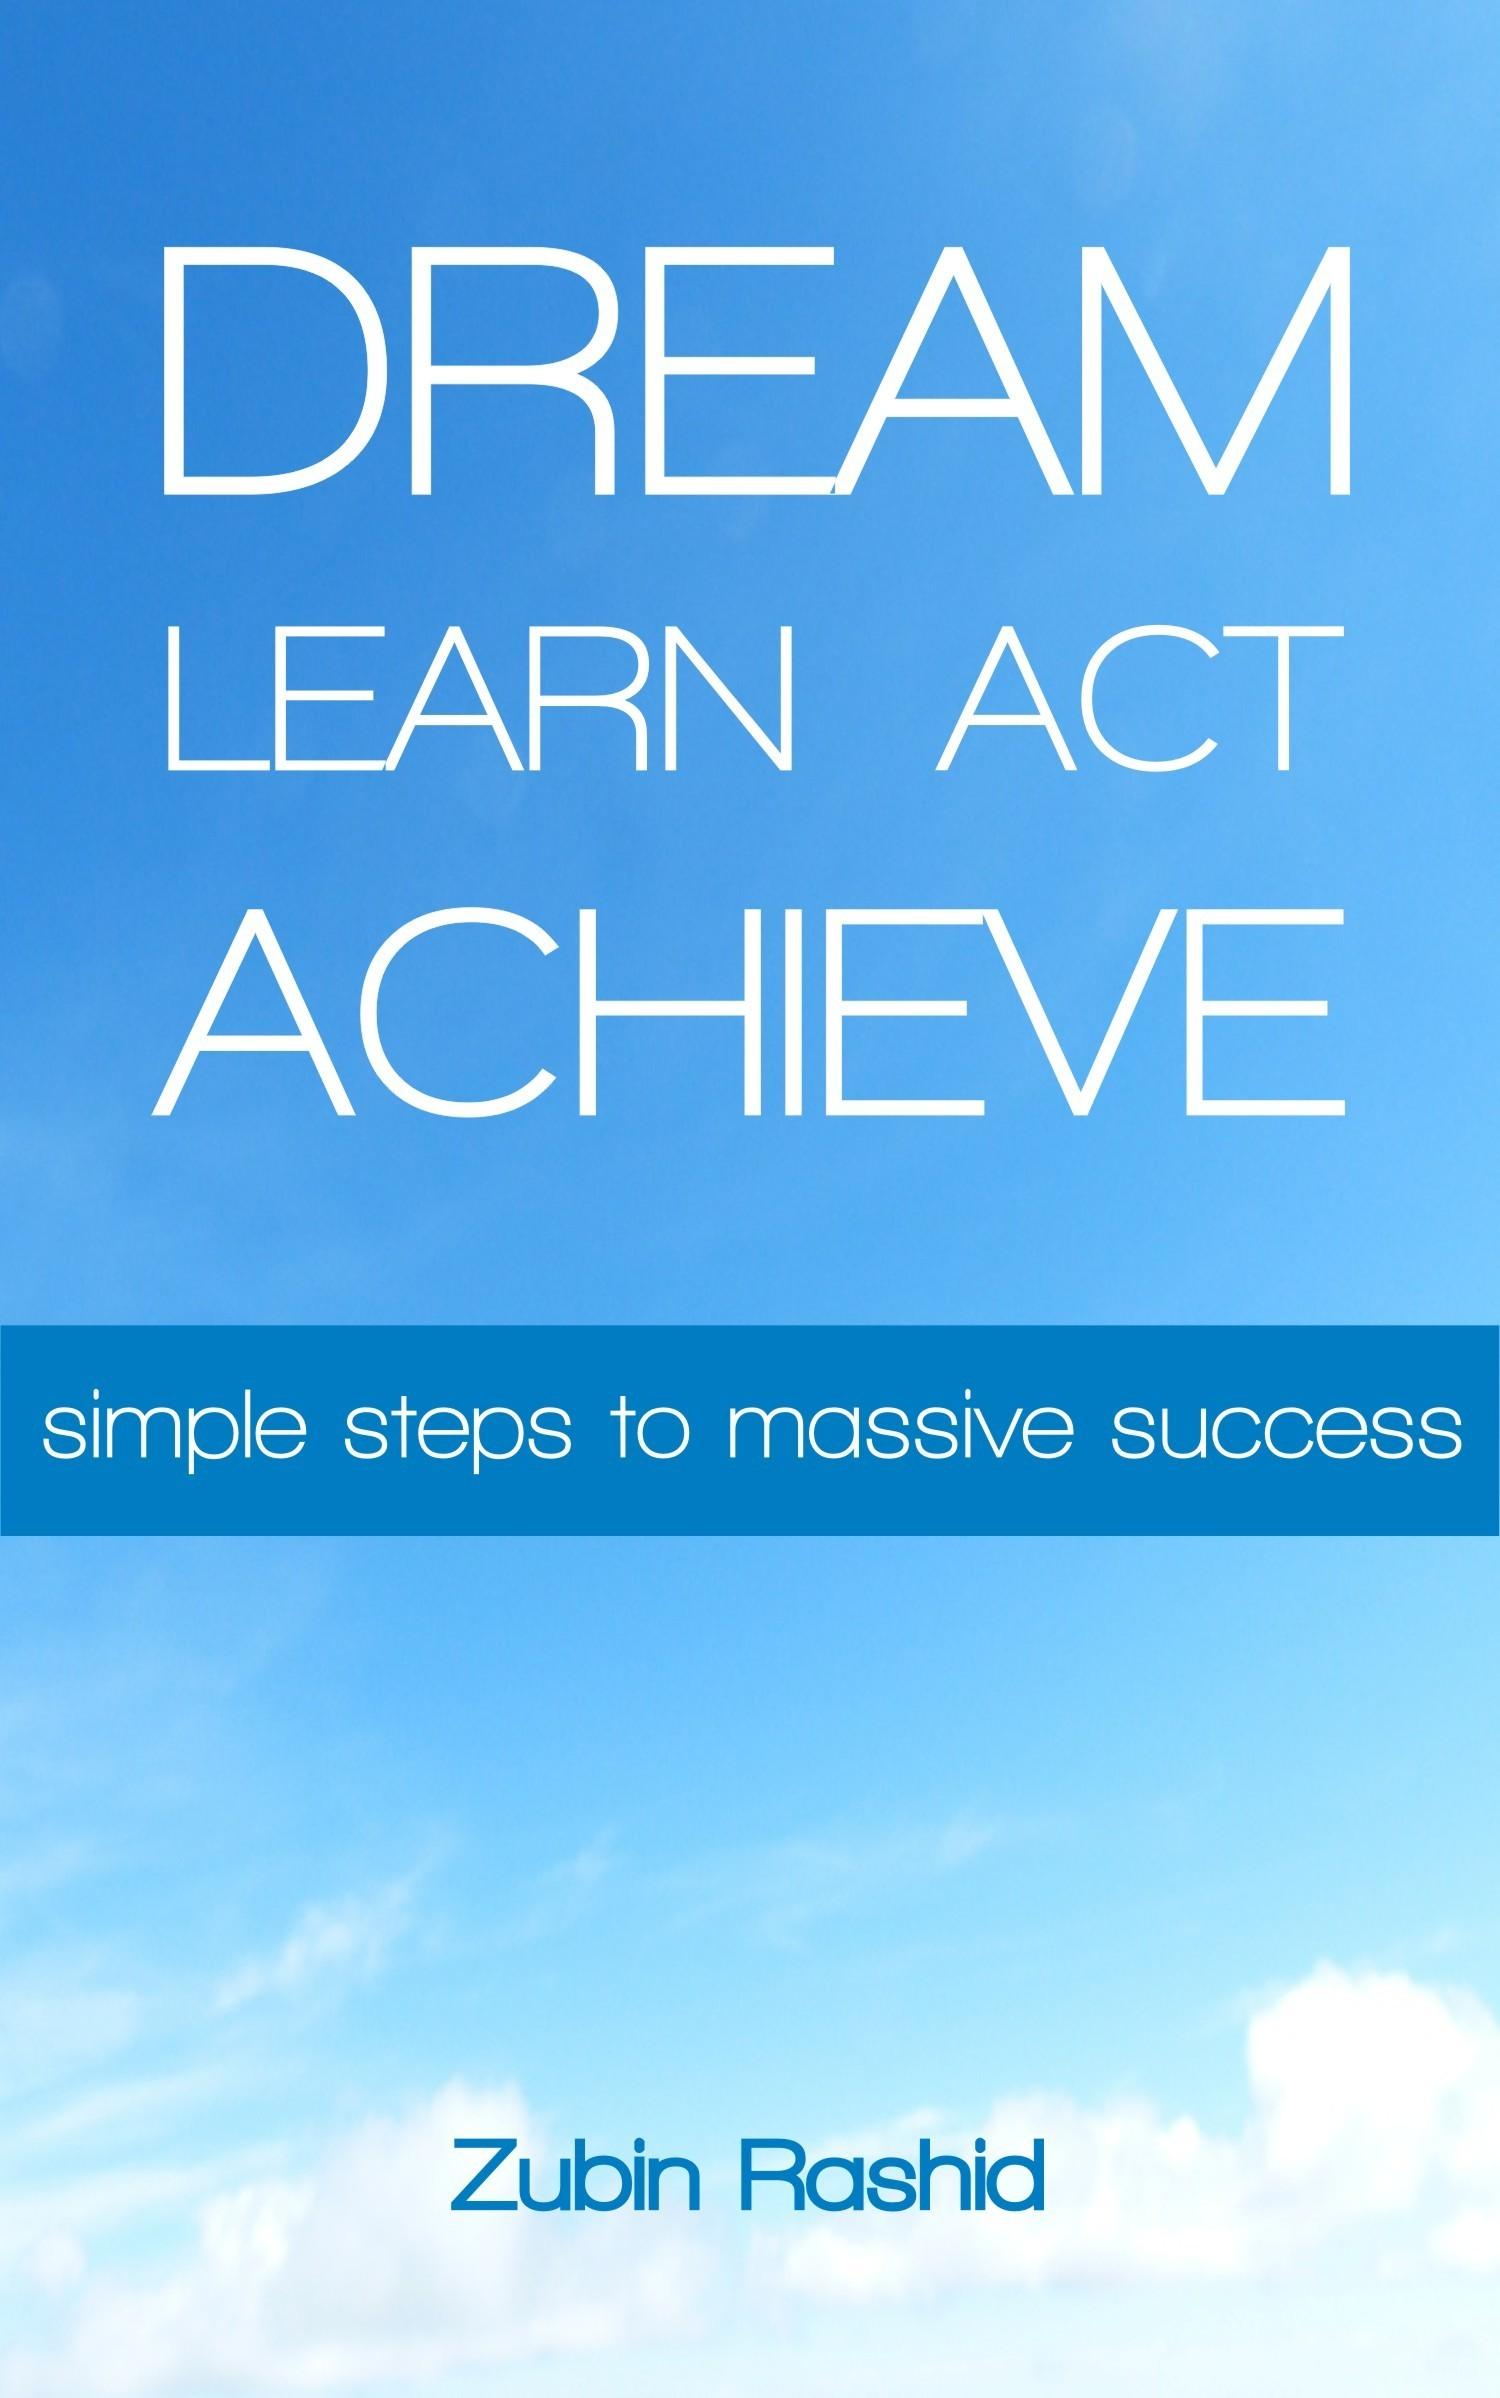 Dream Learn Act Achieve: Simple Steps to Massive Success Zubin Rashid